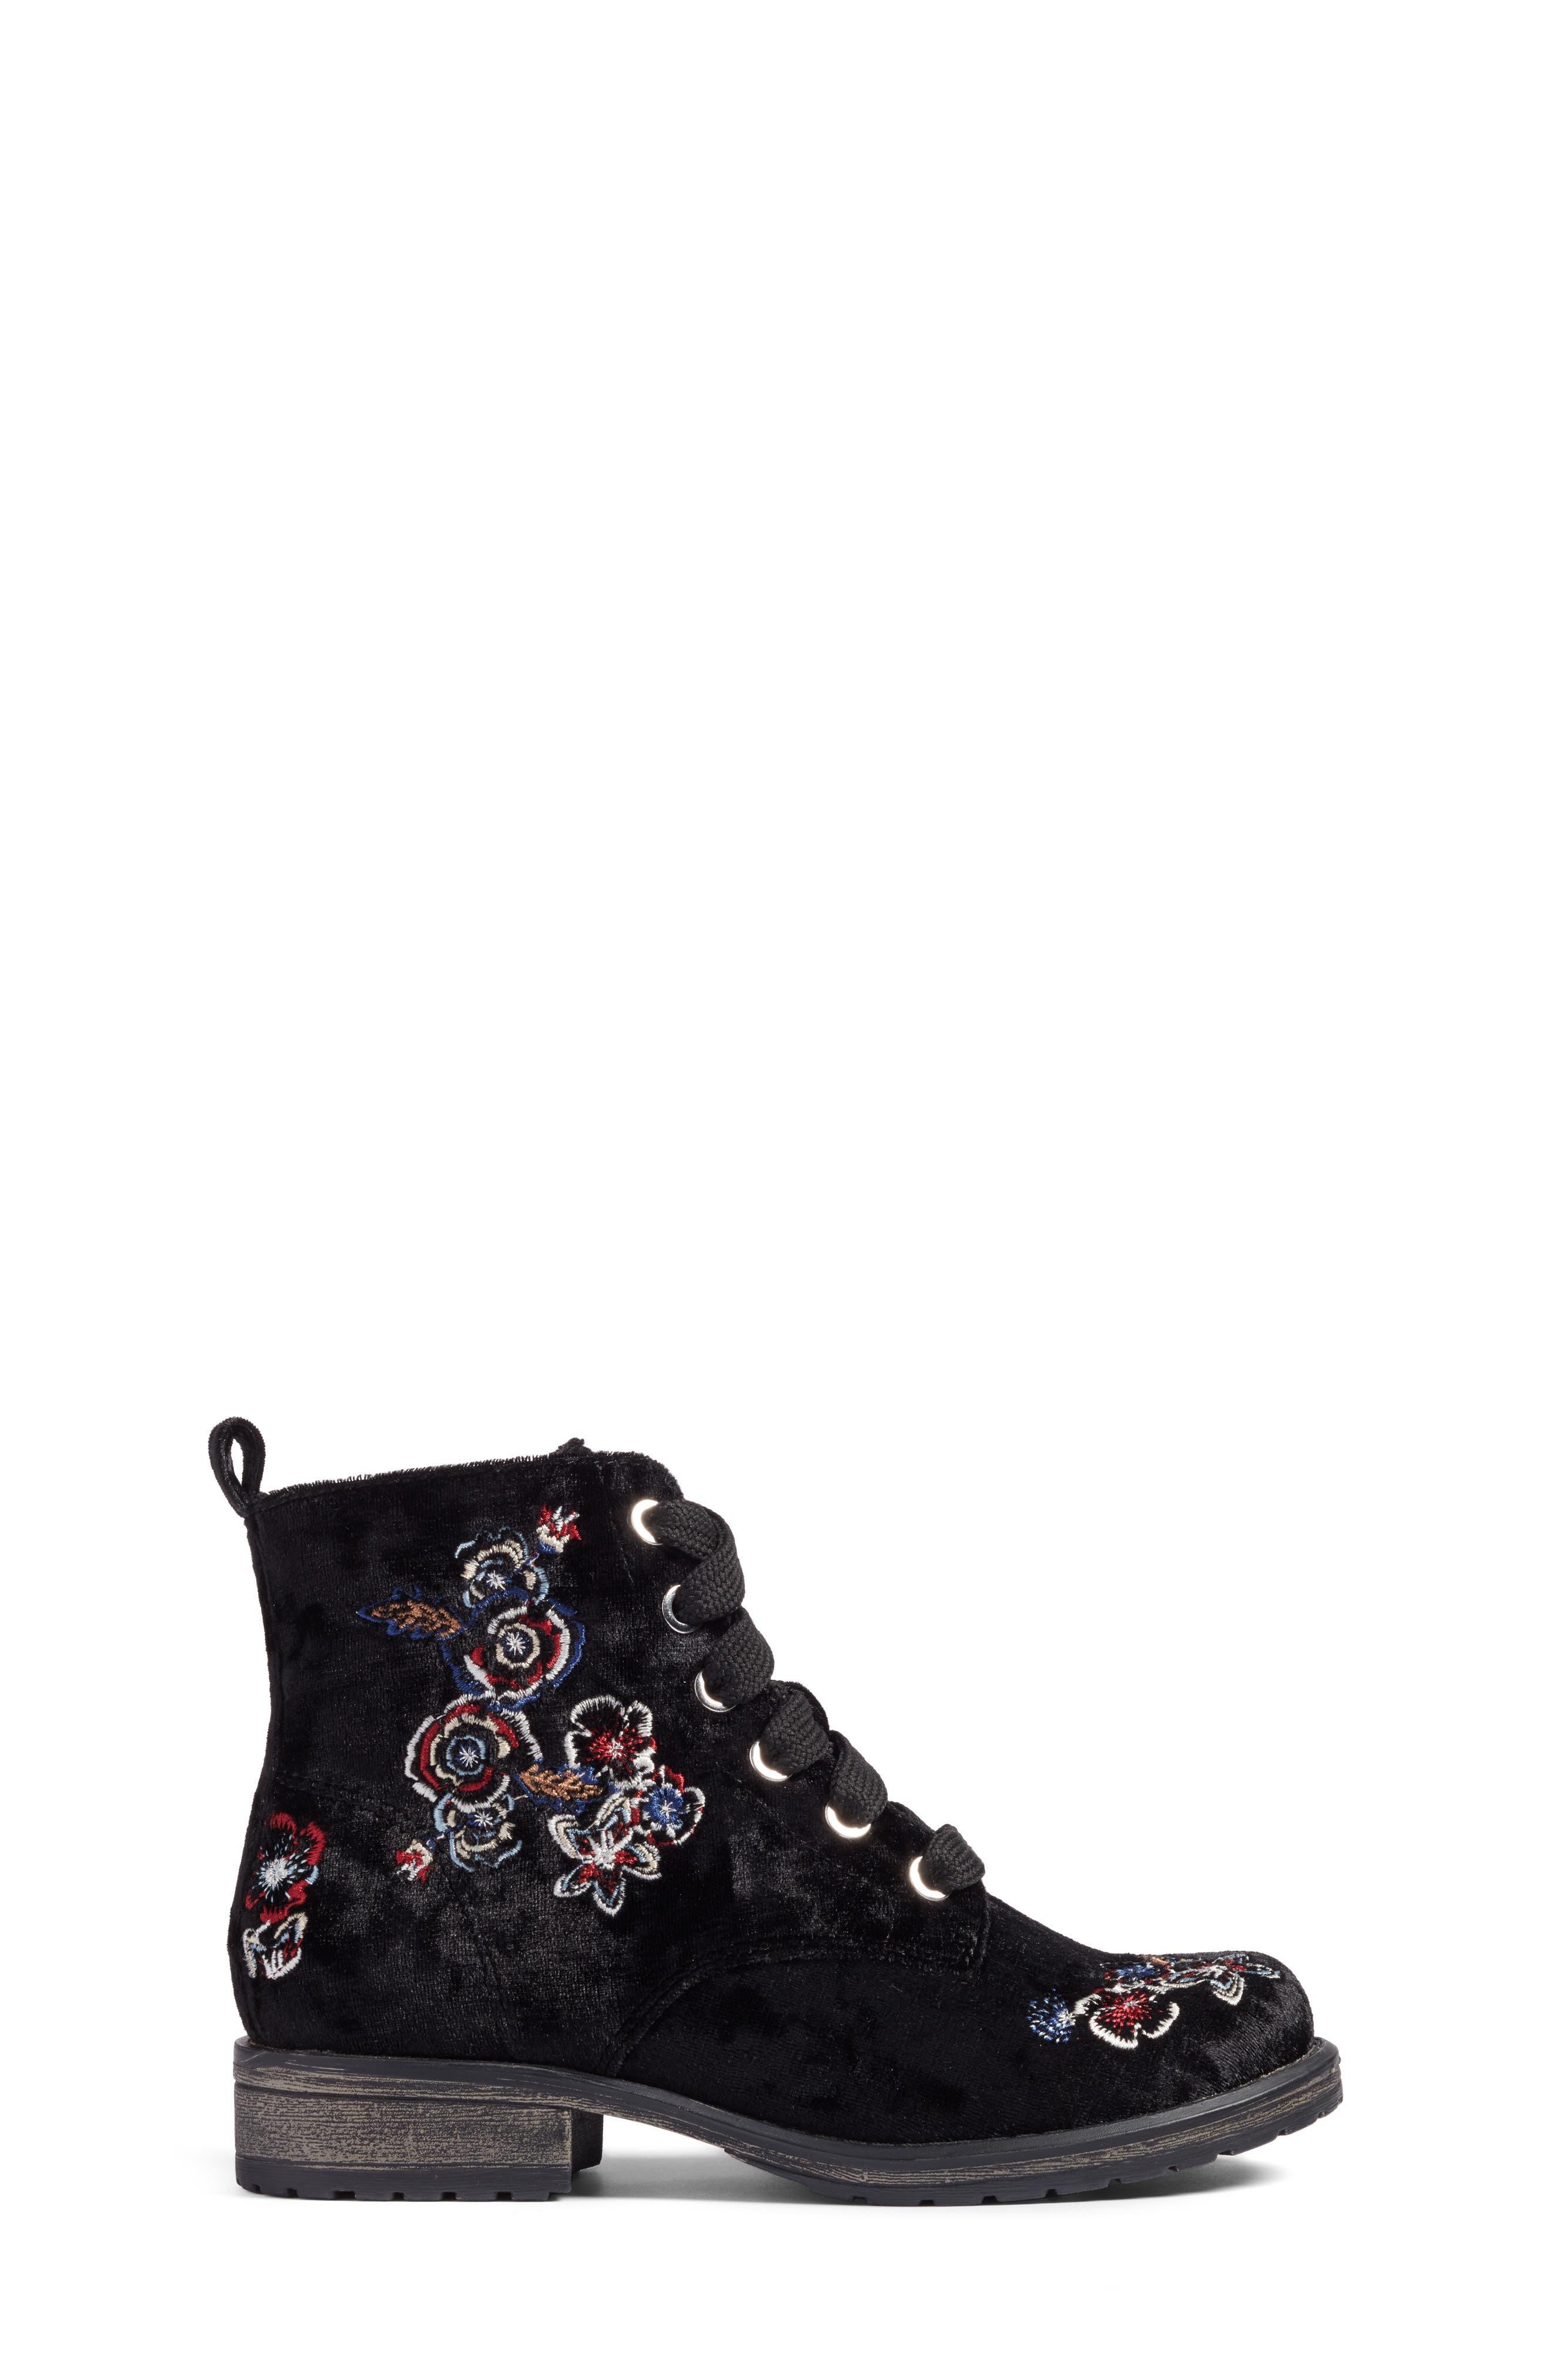 Lilla Combat Boot,                             Alternate thumbnail 3, color,                             Black Multi Velvet